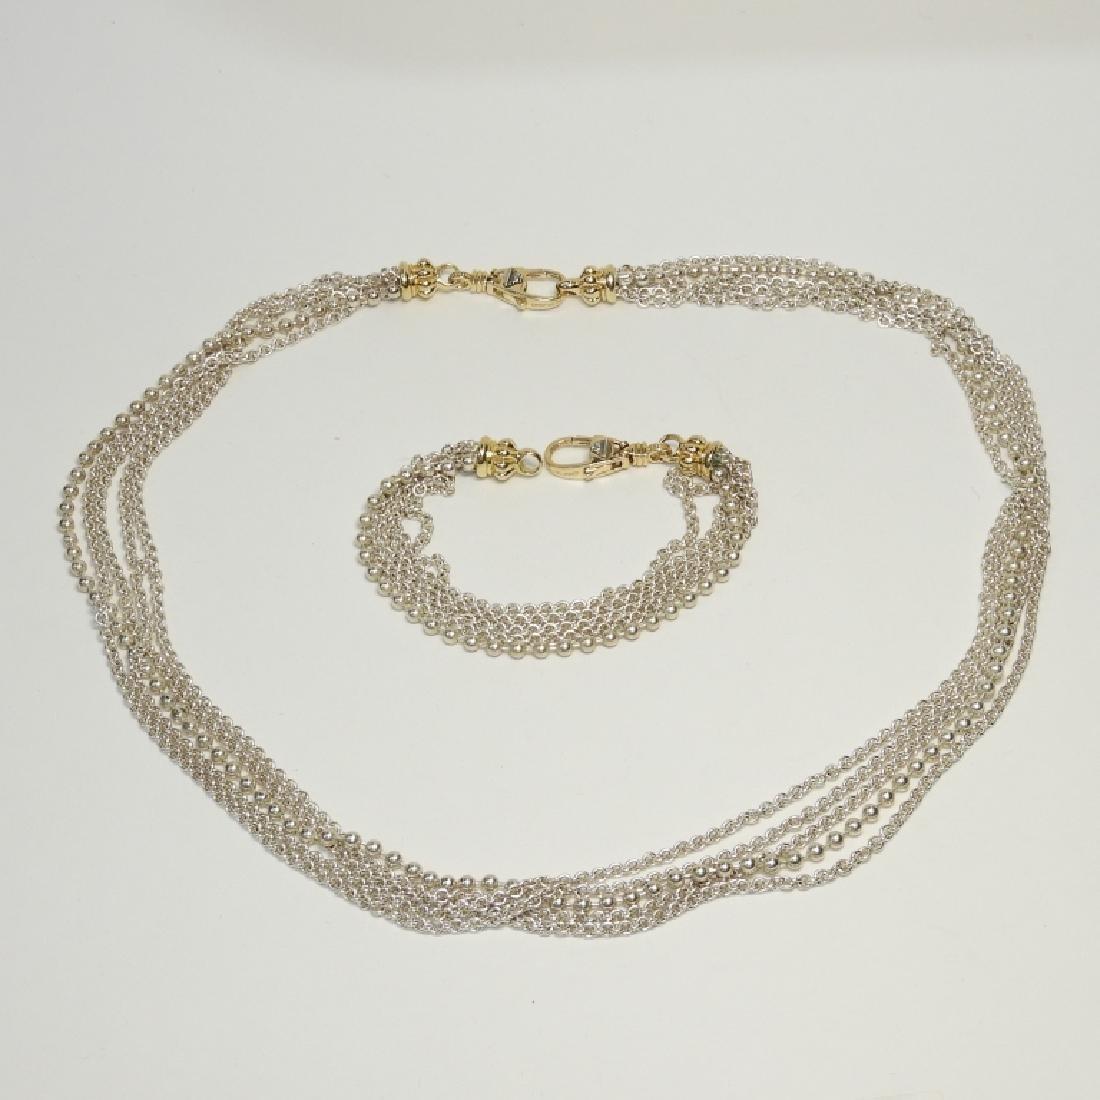 Lagos Caviar S.S. 18K Gold Necklace & Bracelet